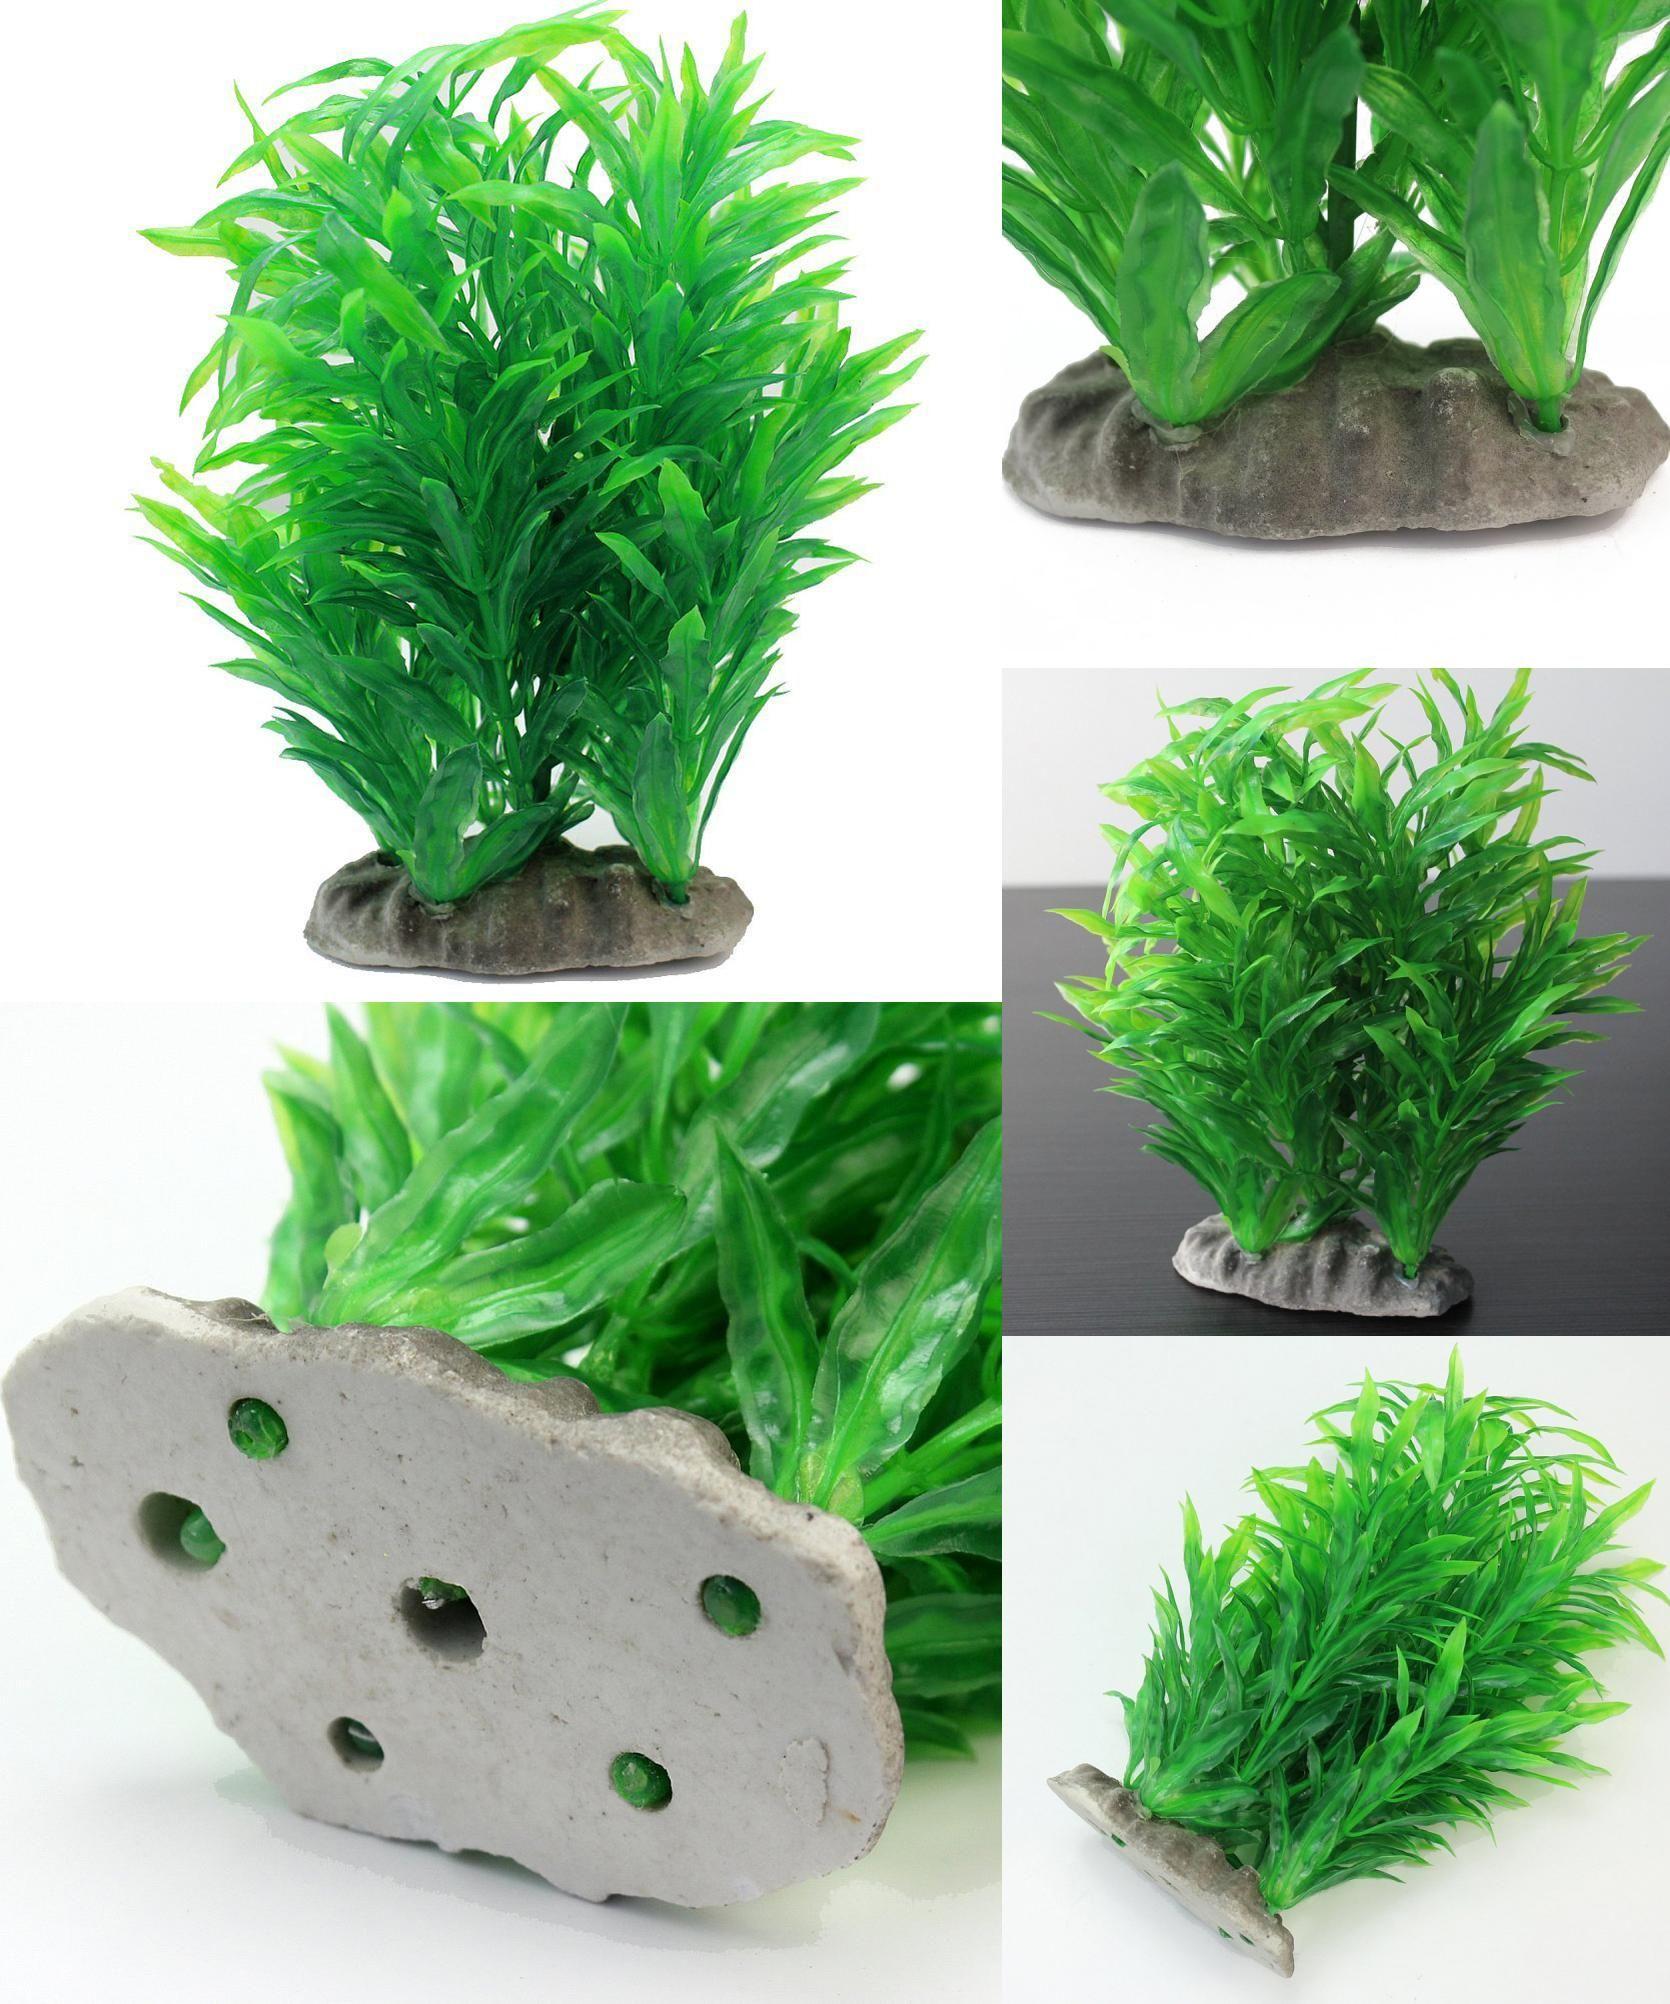 Visit to Buy] 2016 Aquarium Plants Grass Artificial Aquarium Plants